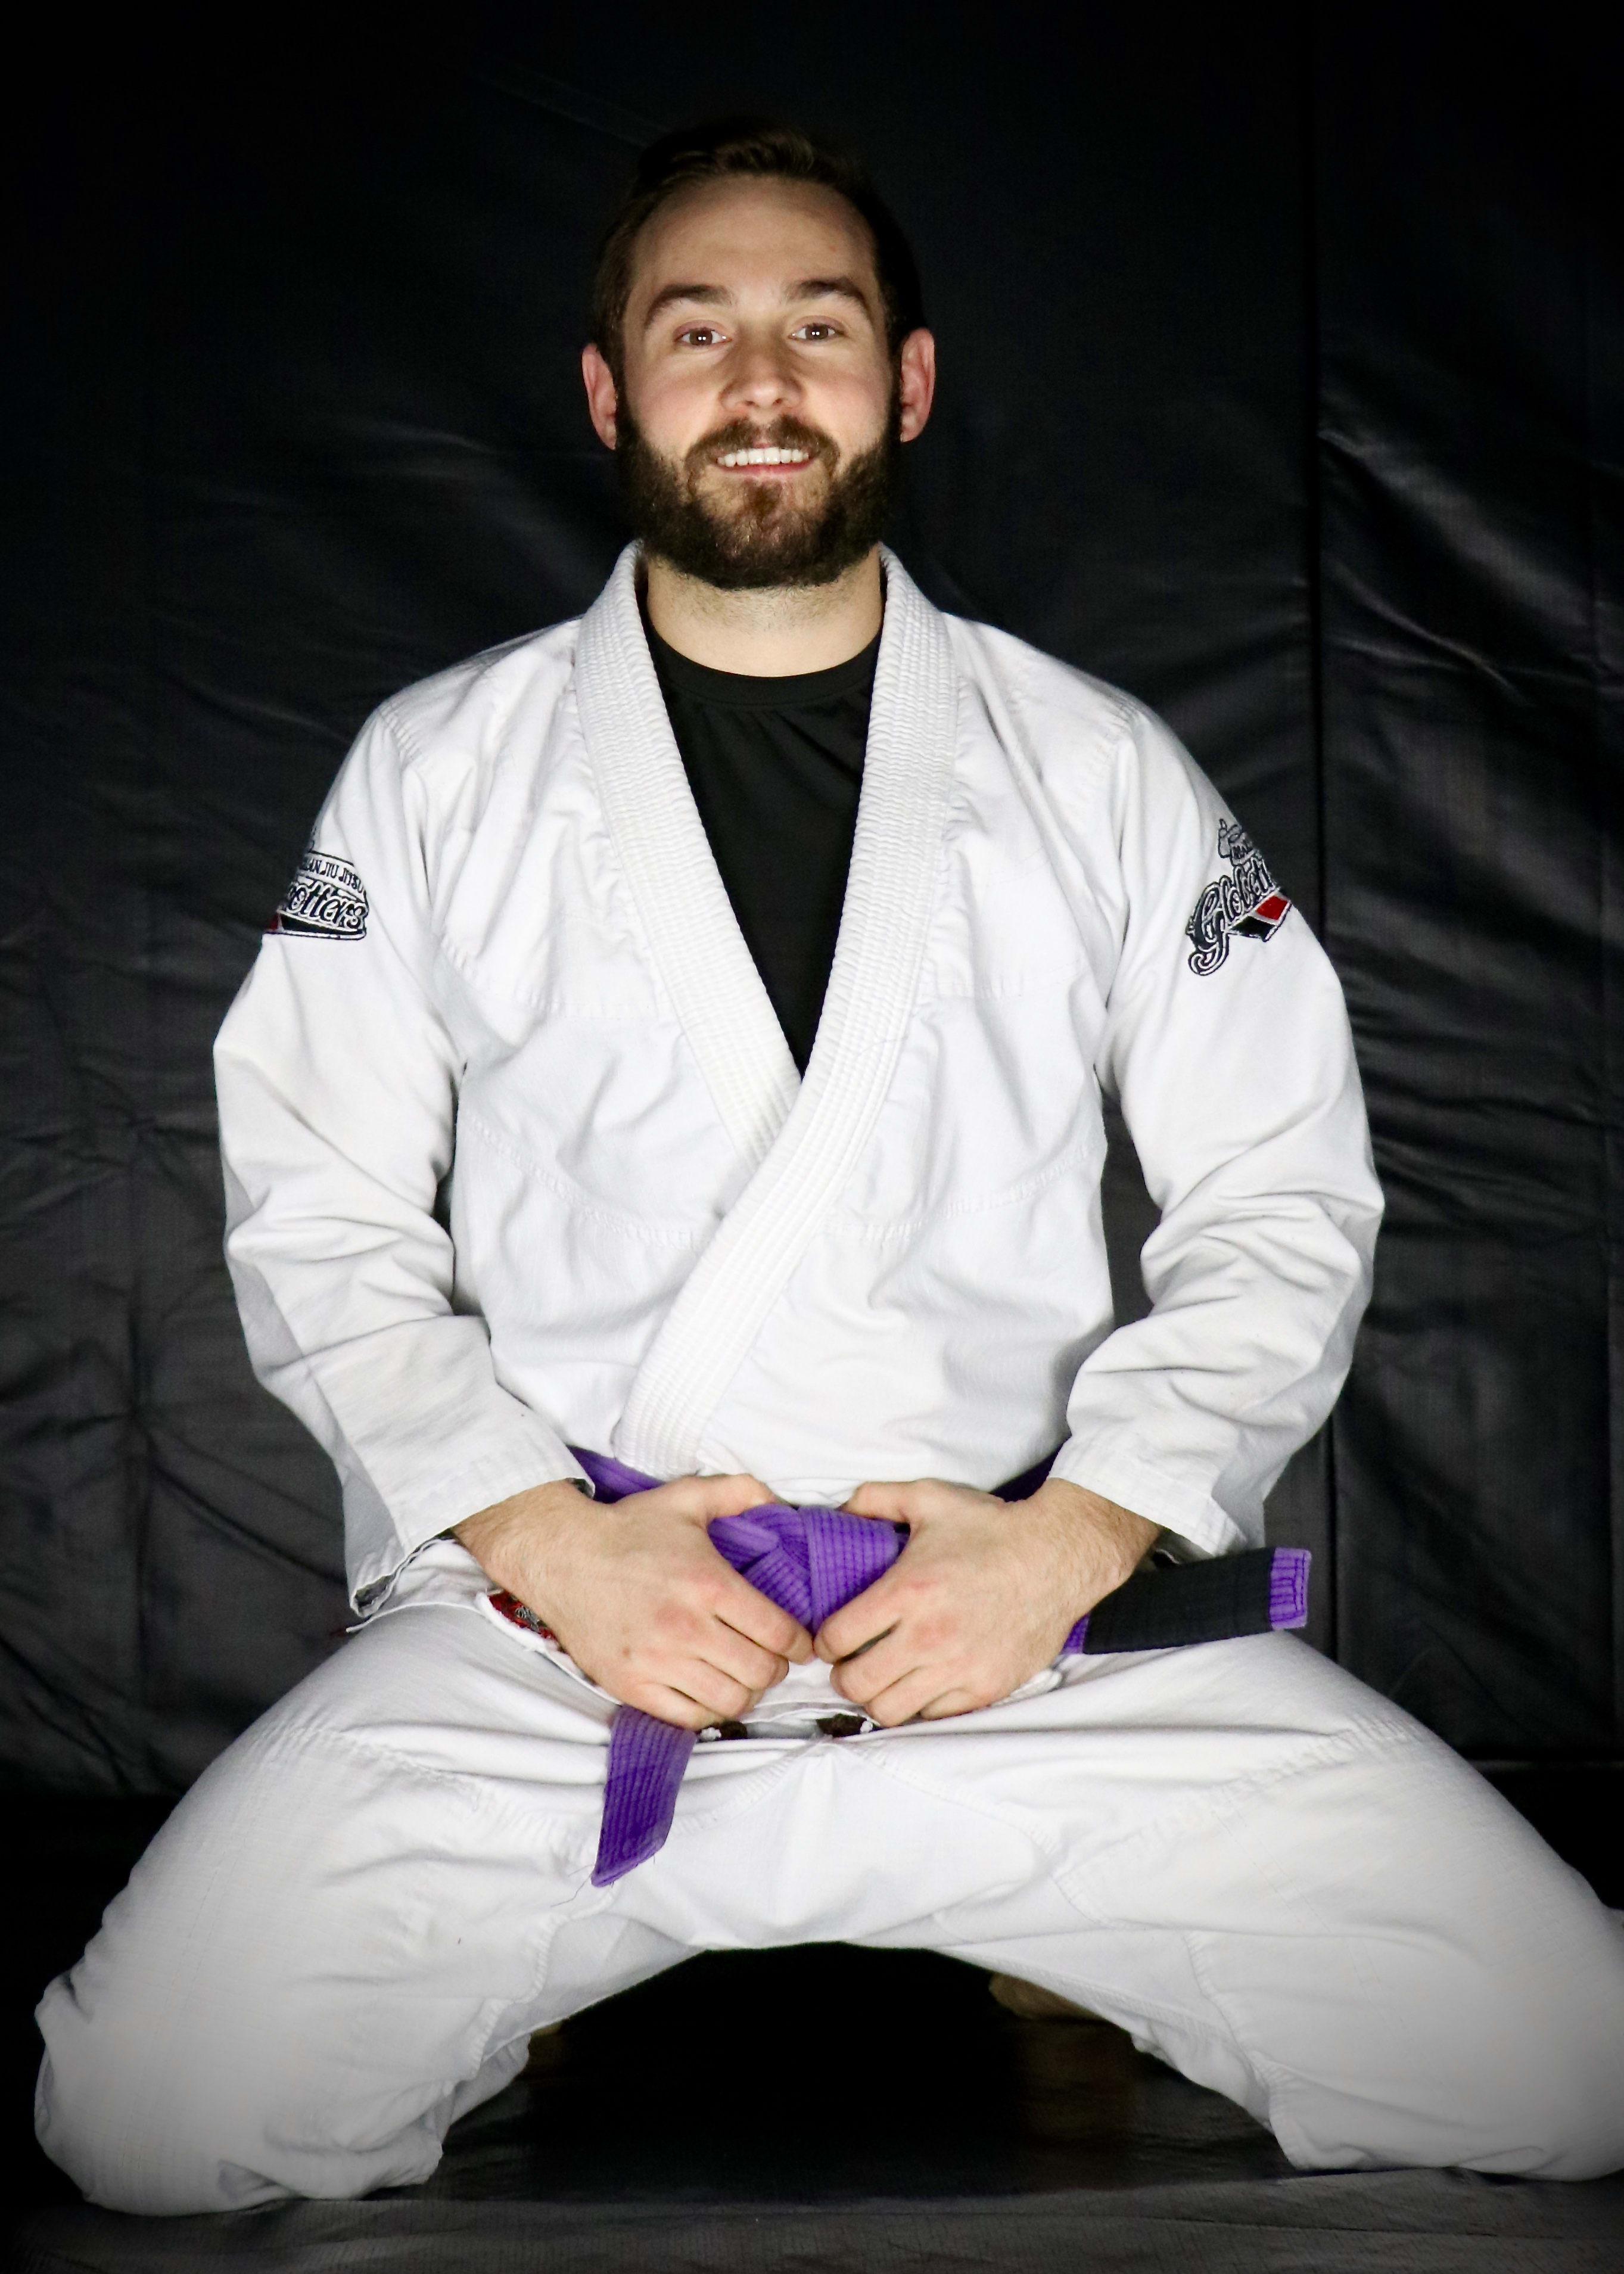 Nick Lanspa in Denver - Dark Horse Combat Club